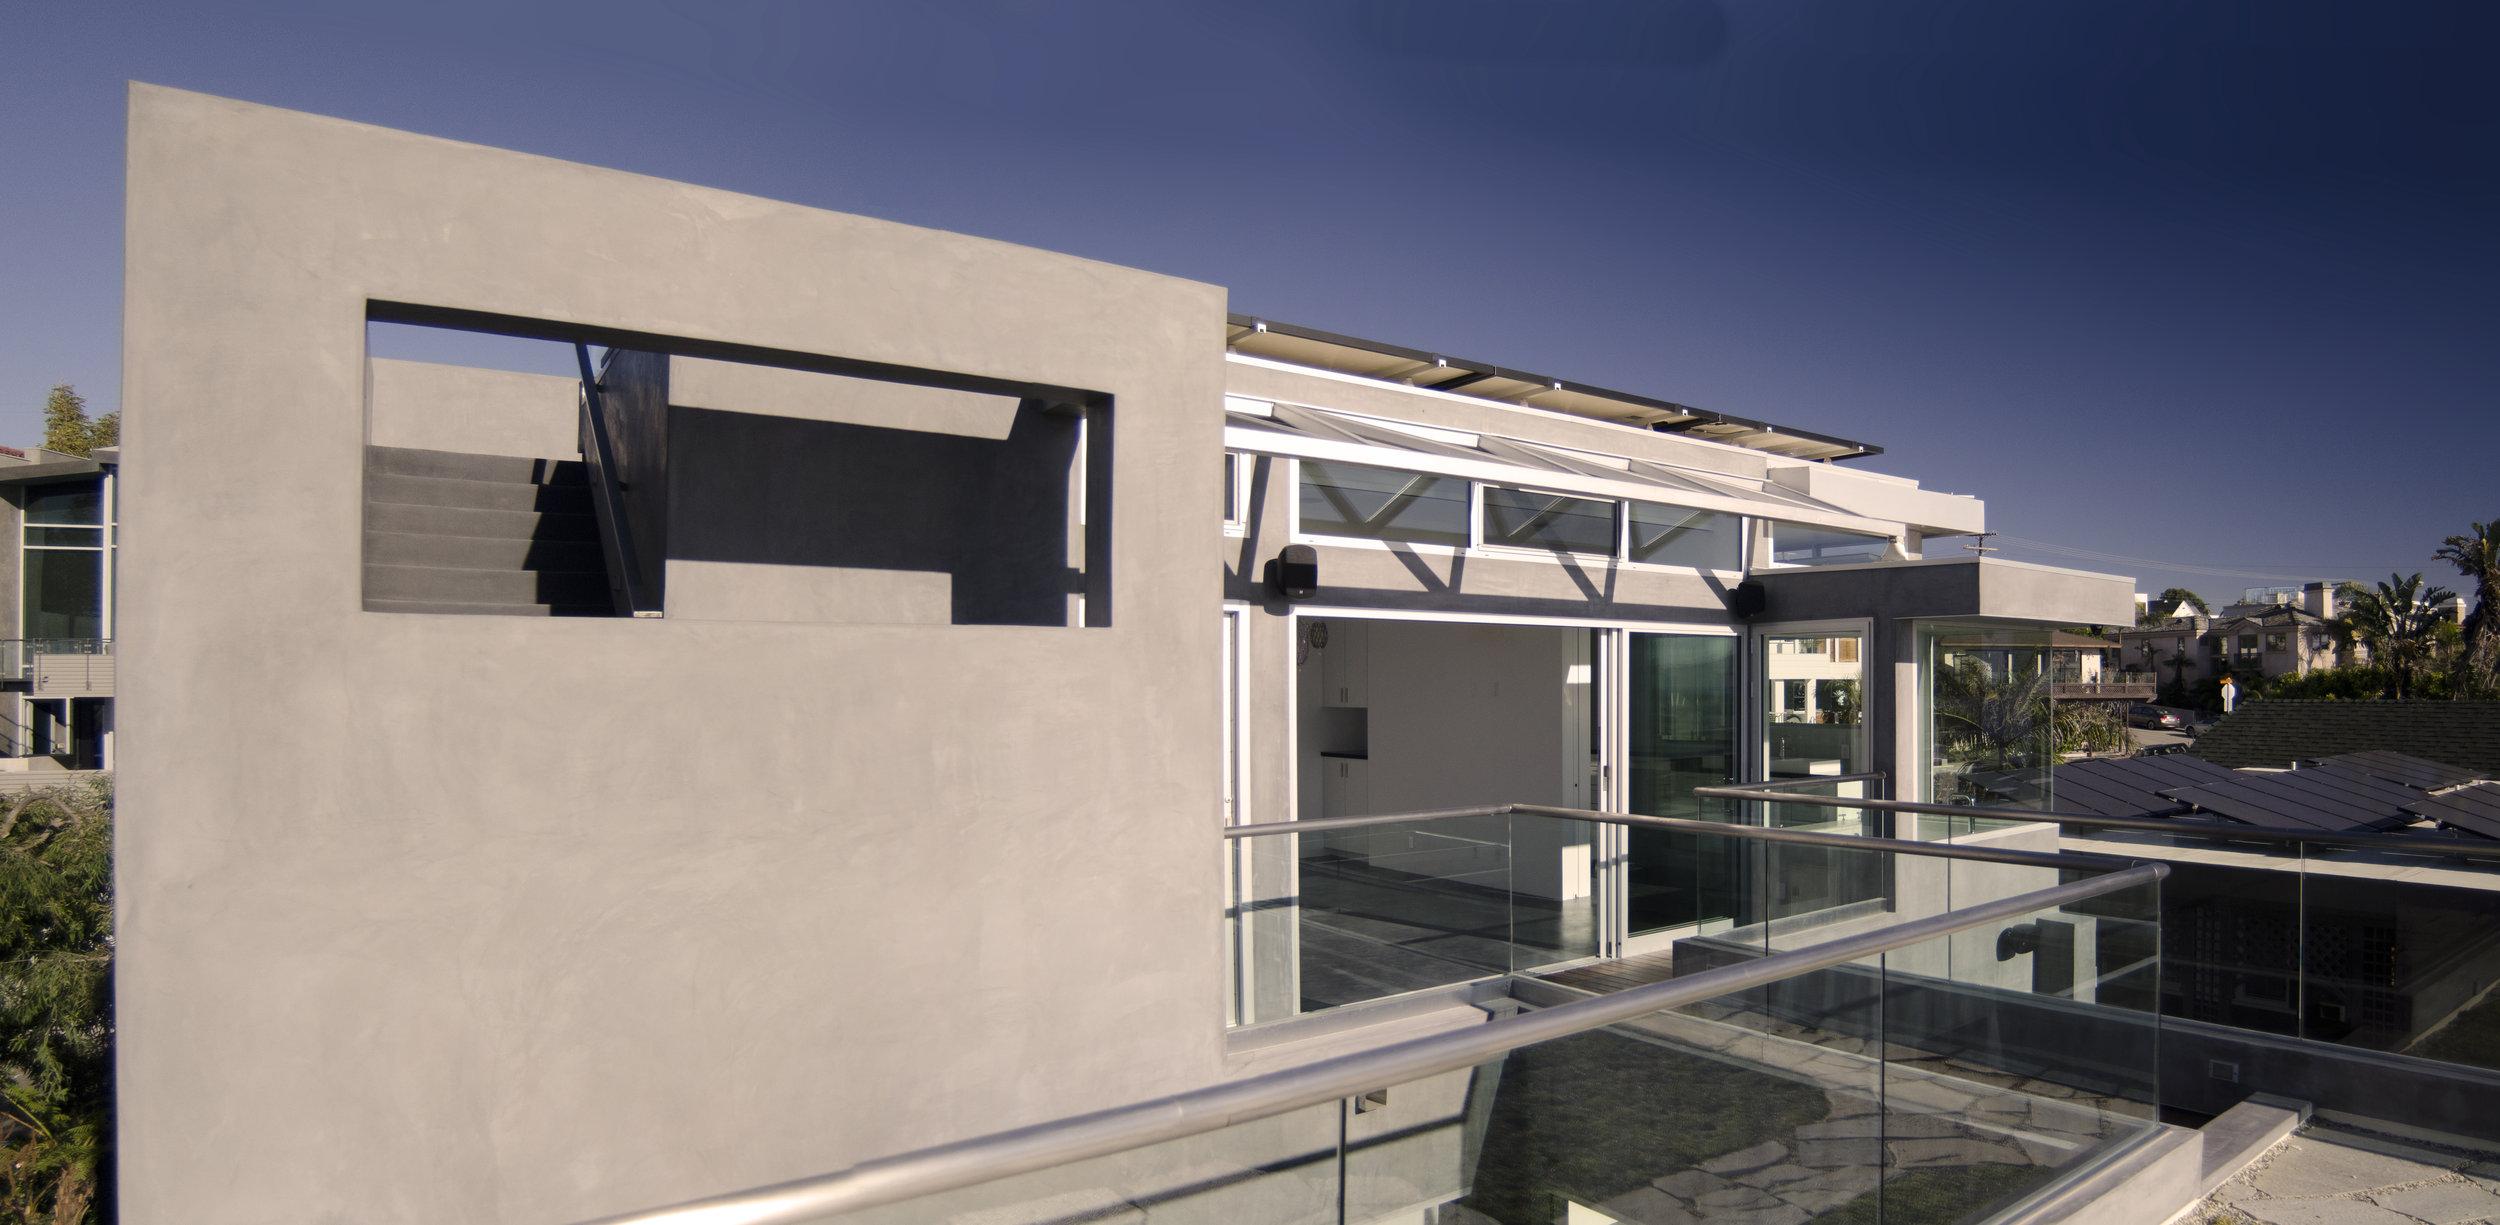 S.E.A.-Studio-Environmental-Architecture-David-Hertz-FAIA-Hermosa-Beach-House-sustainable-regenerative-restorative-design-residential-contemporary-modern-green-roof-ocean-view-pool-tile-South-Bay-living-studioea-1.jpg